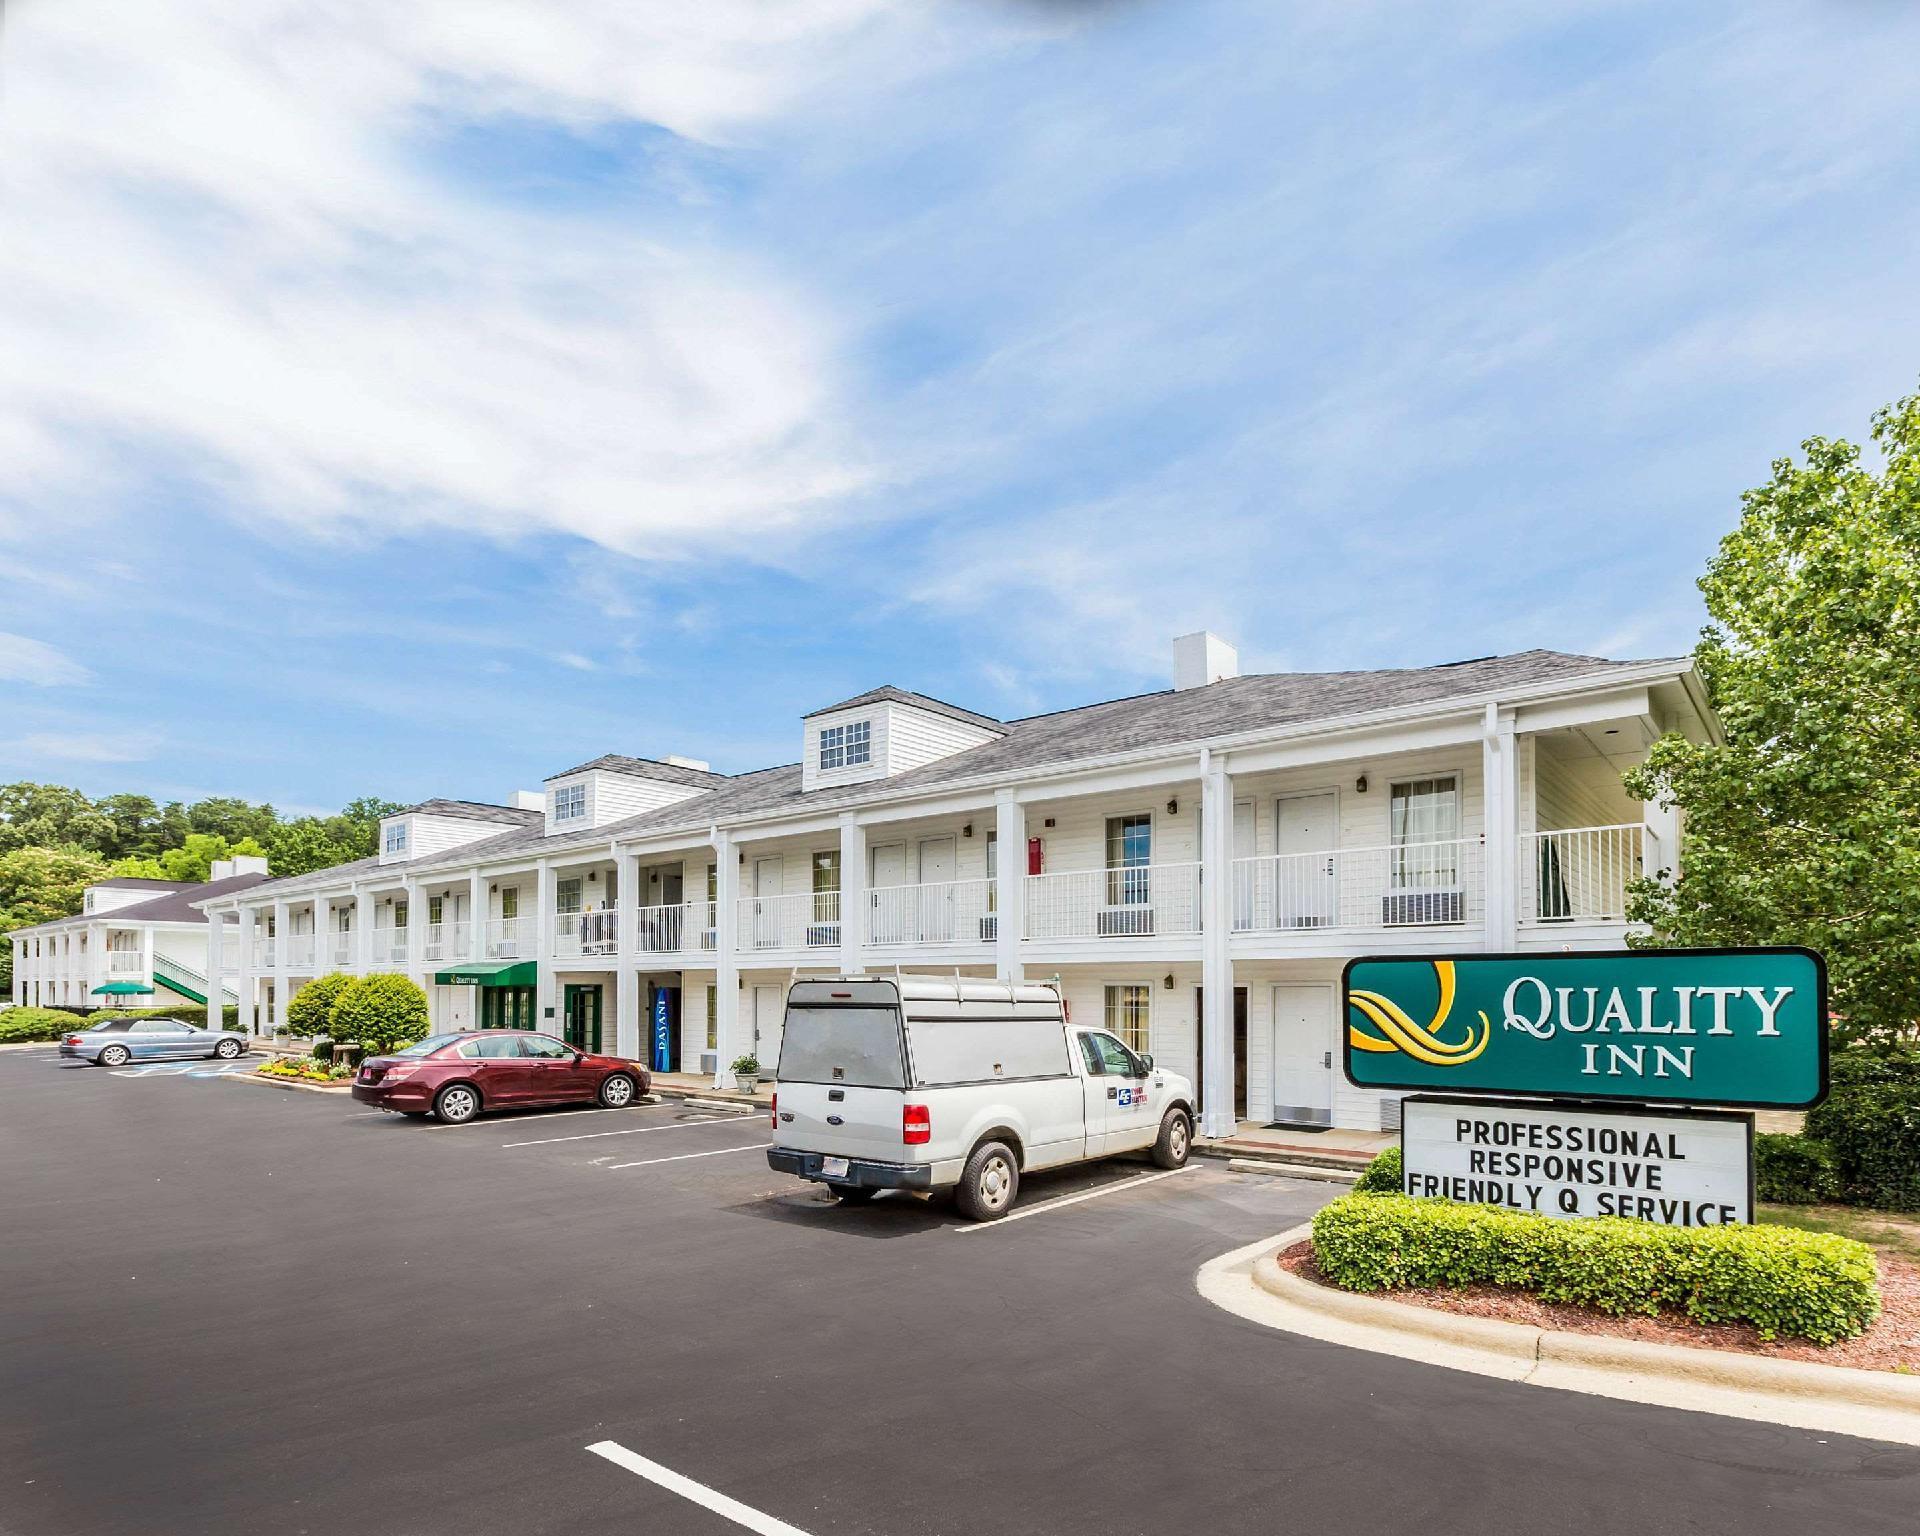 Quality Inn Trussville I 59 Exit 141